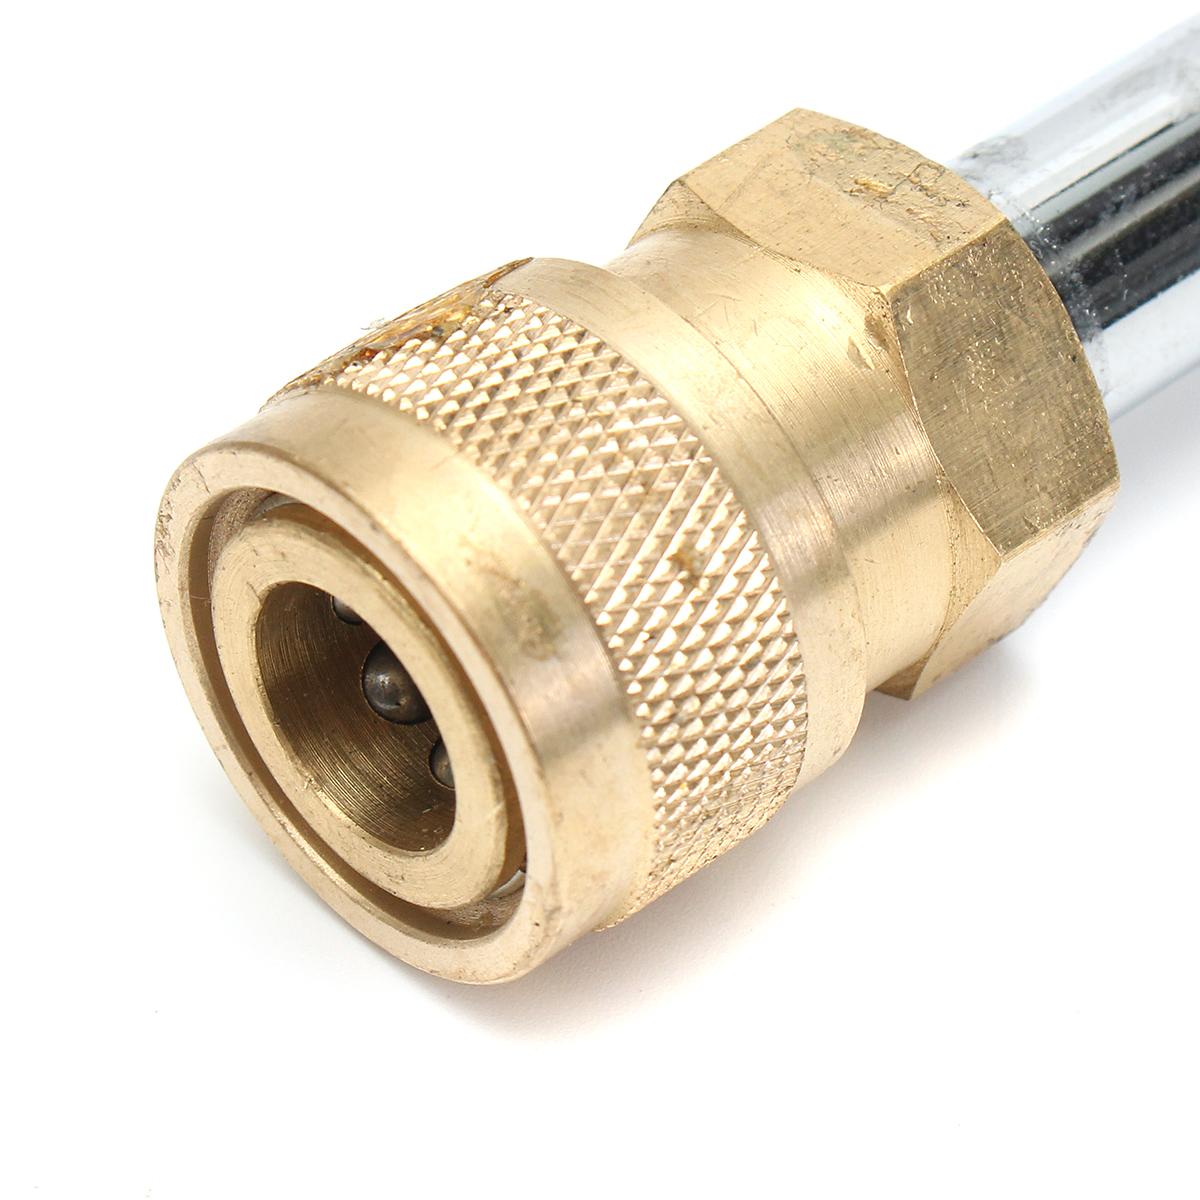 Psi high pressure spray gun kit wand lance water